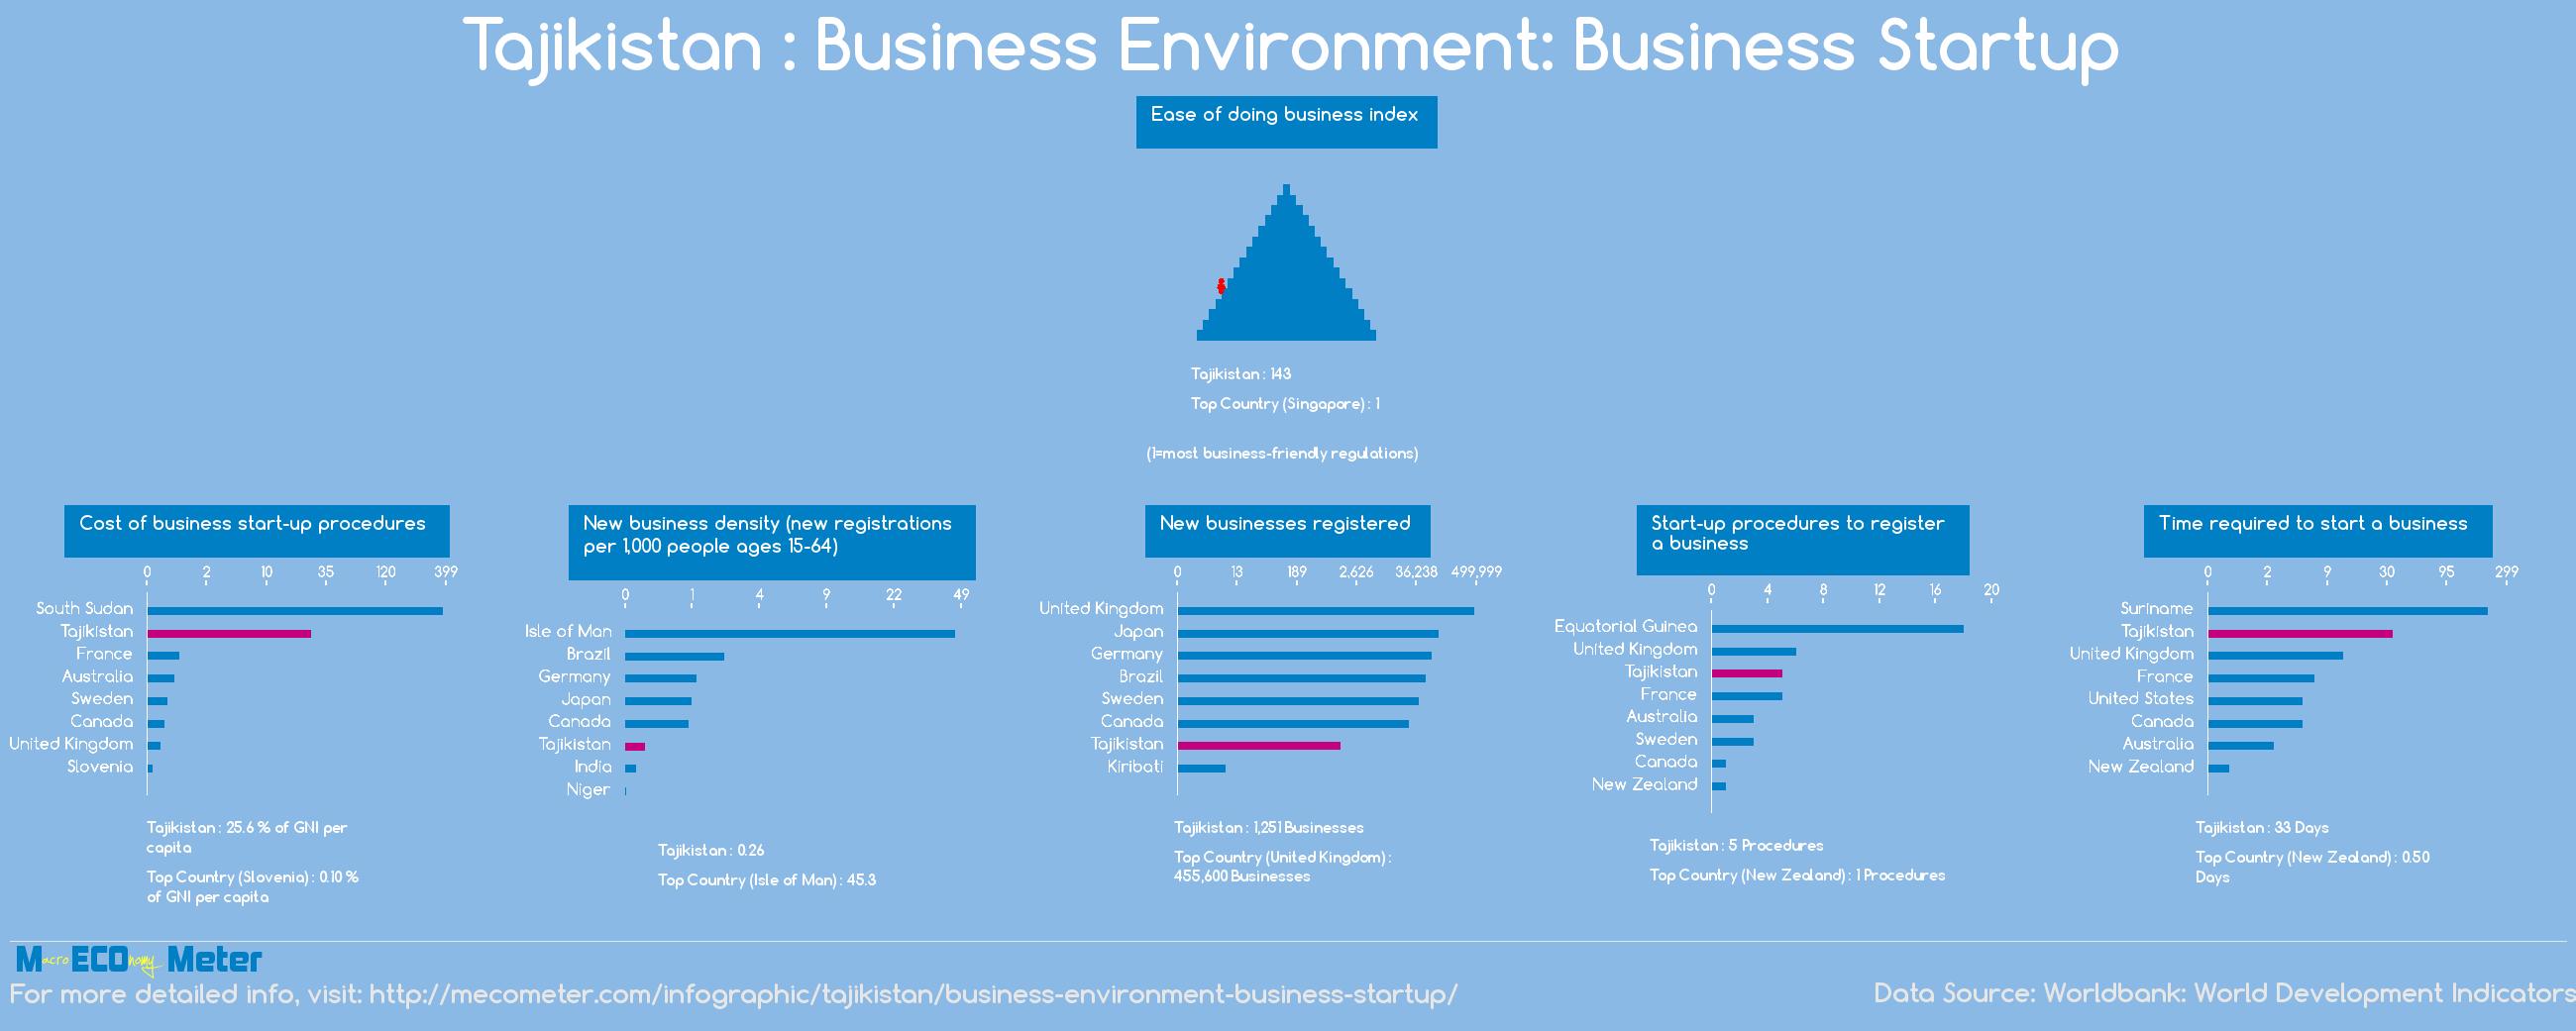 Tajikistan : Business Environment: Business Startup